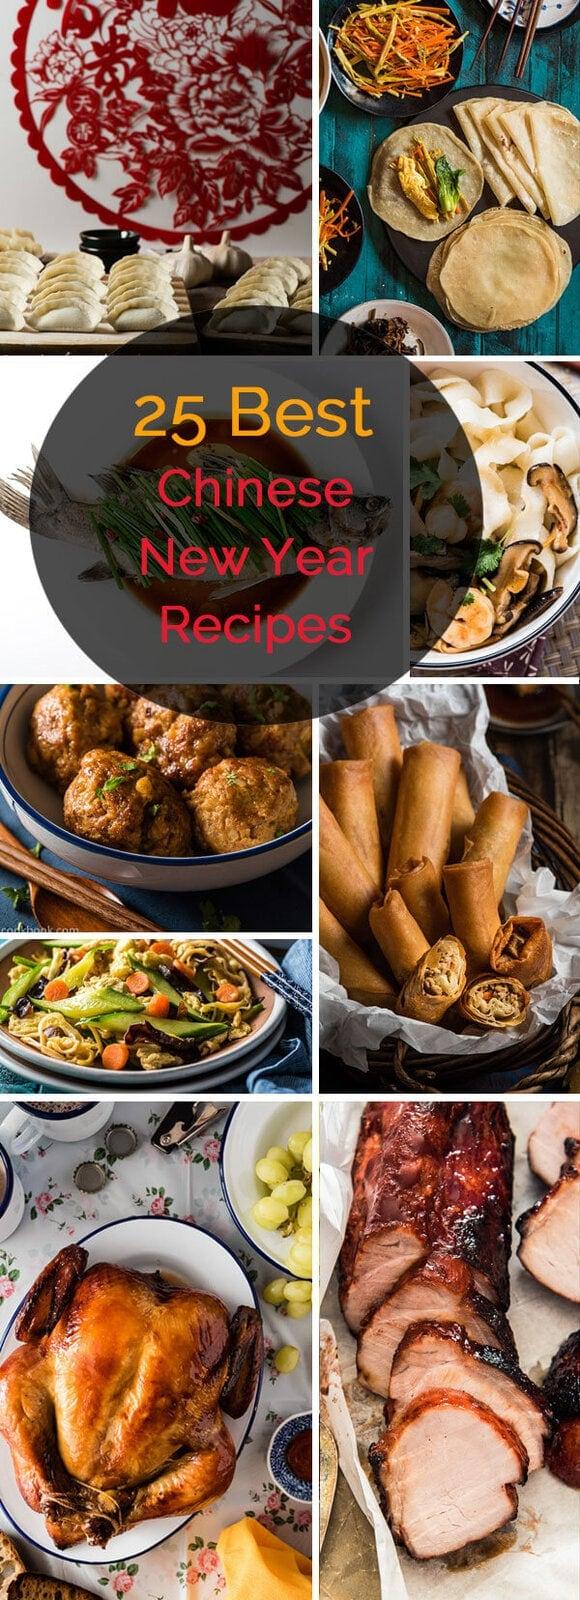 Top 25 Chinese New Year Recipes | omnivorescookbook.com